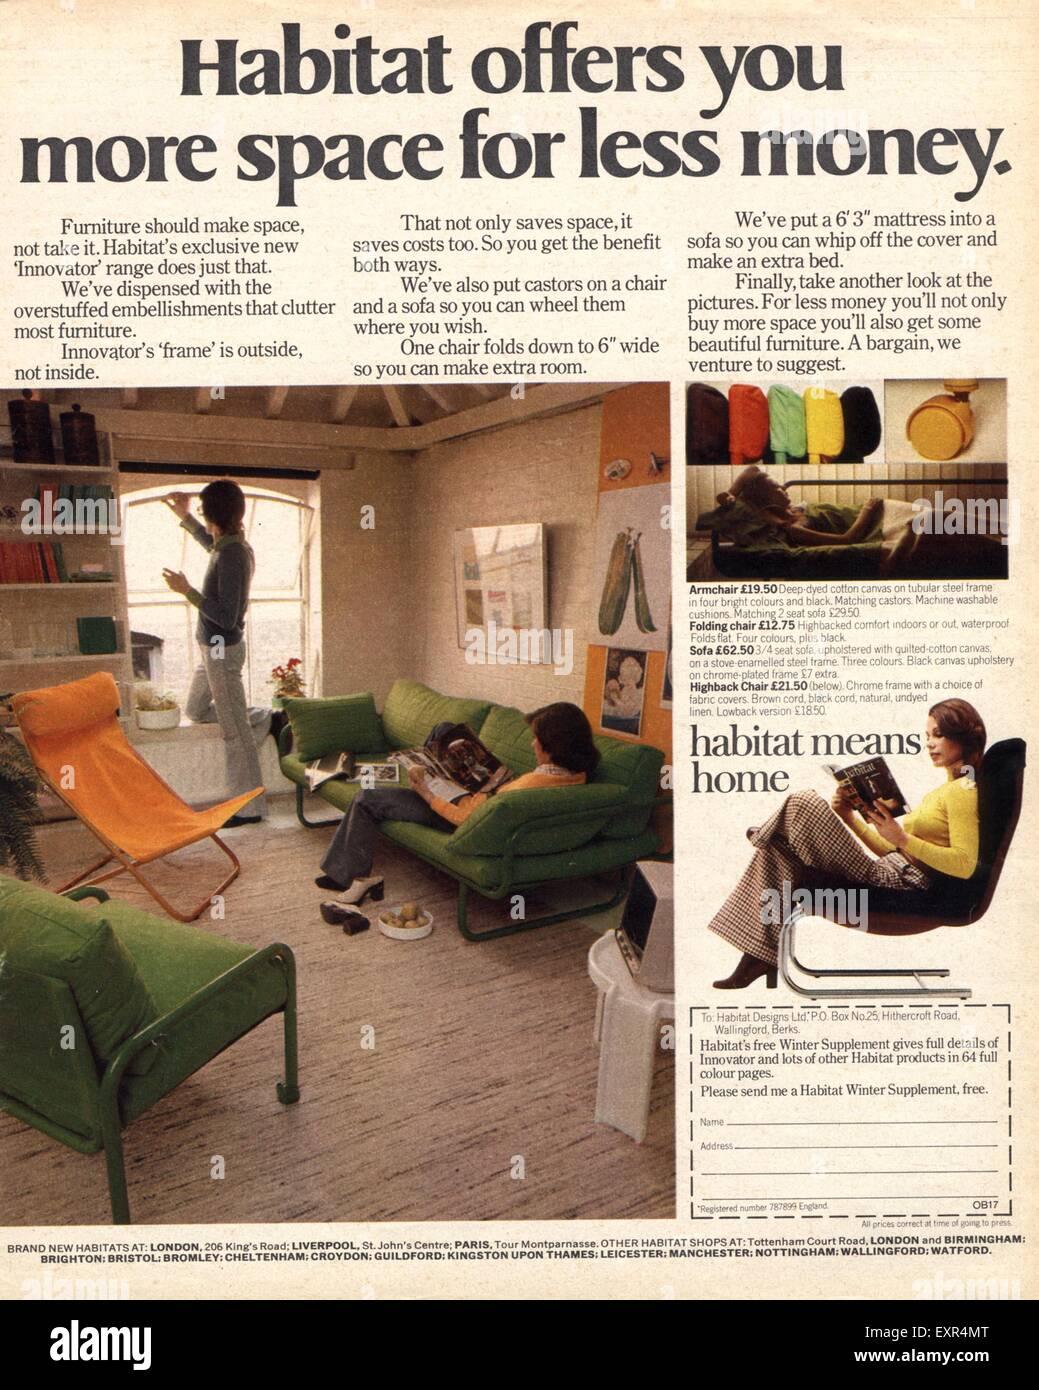 1970s uk interiors 1970s furniture habitat magazine advert stock